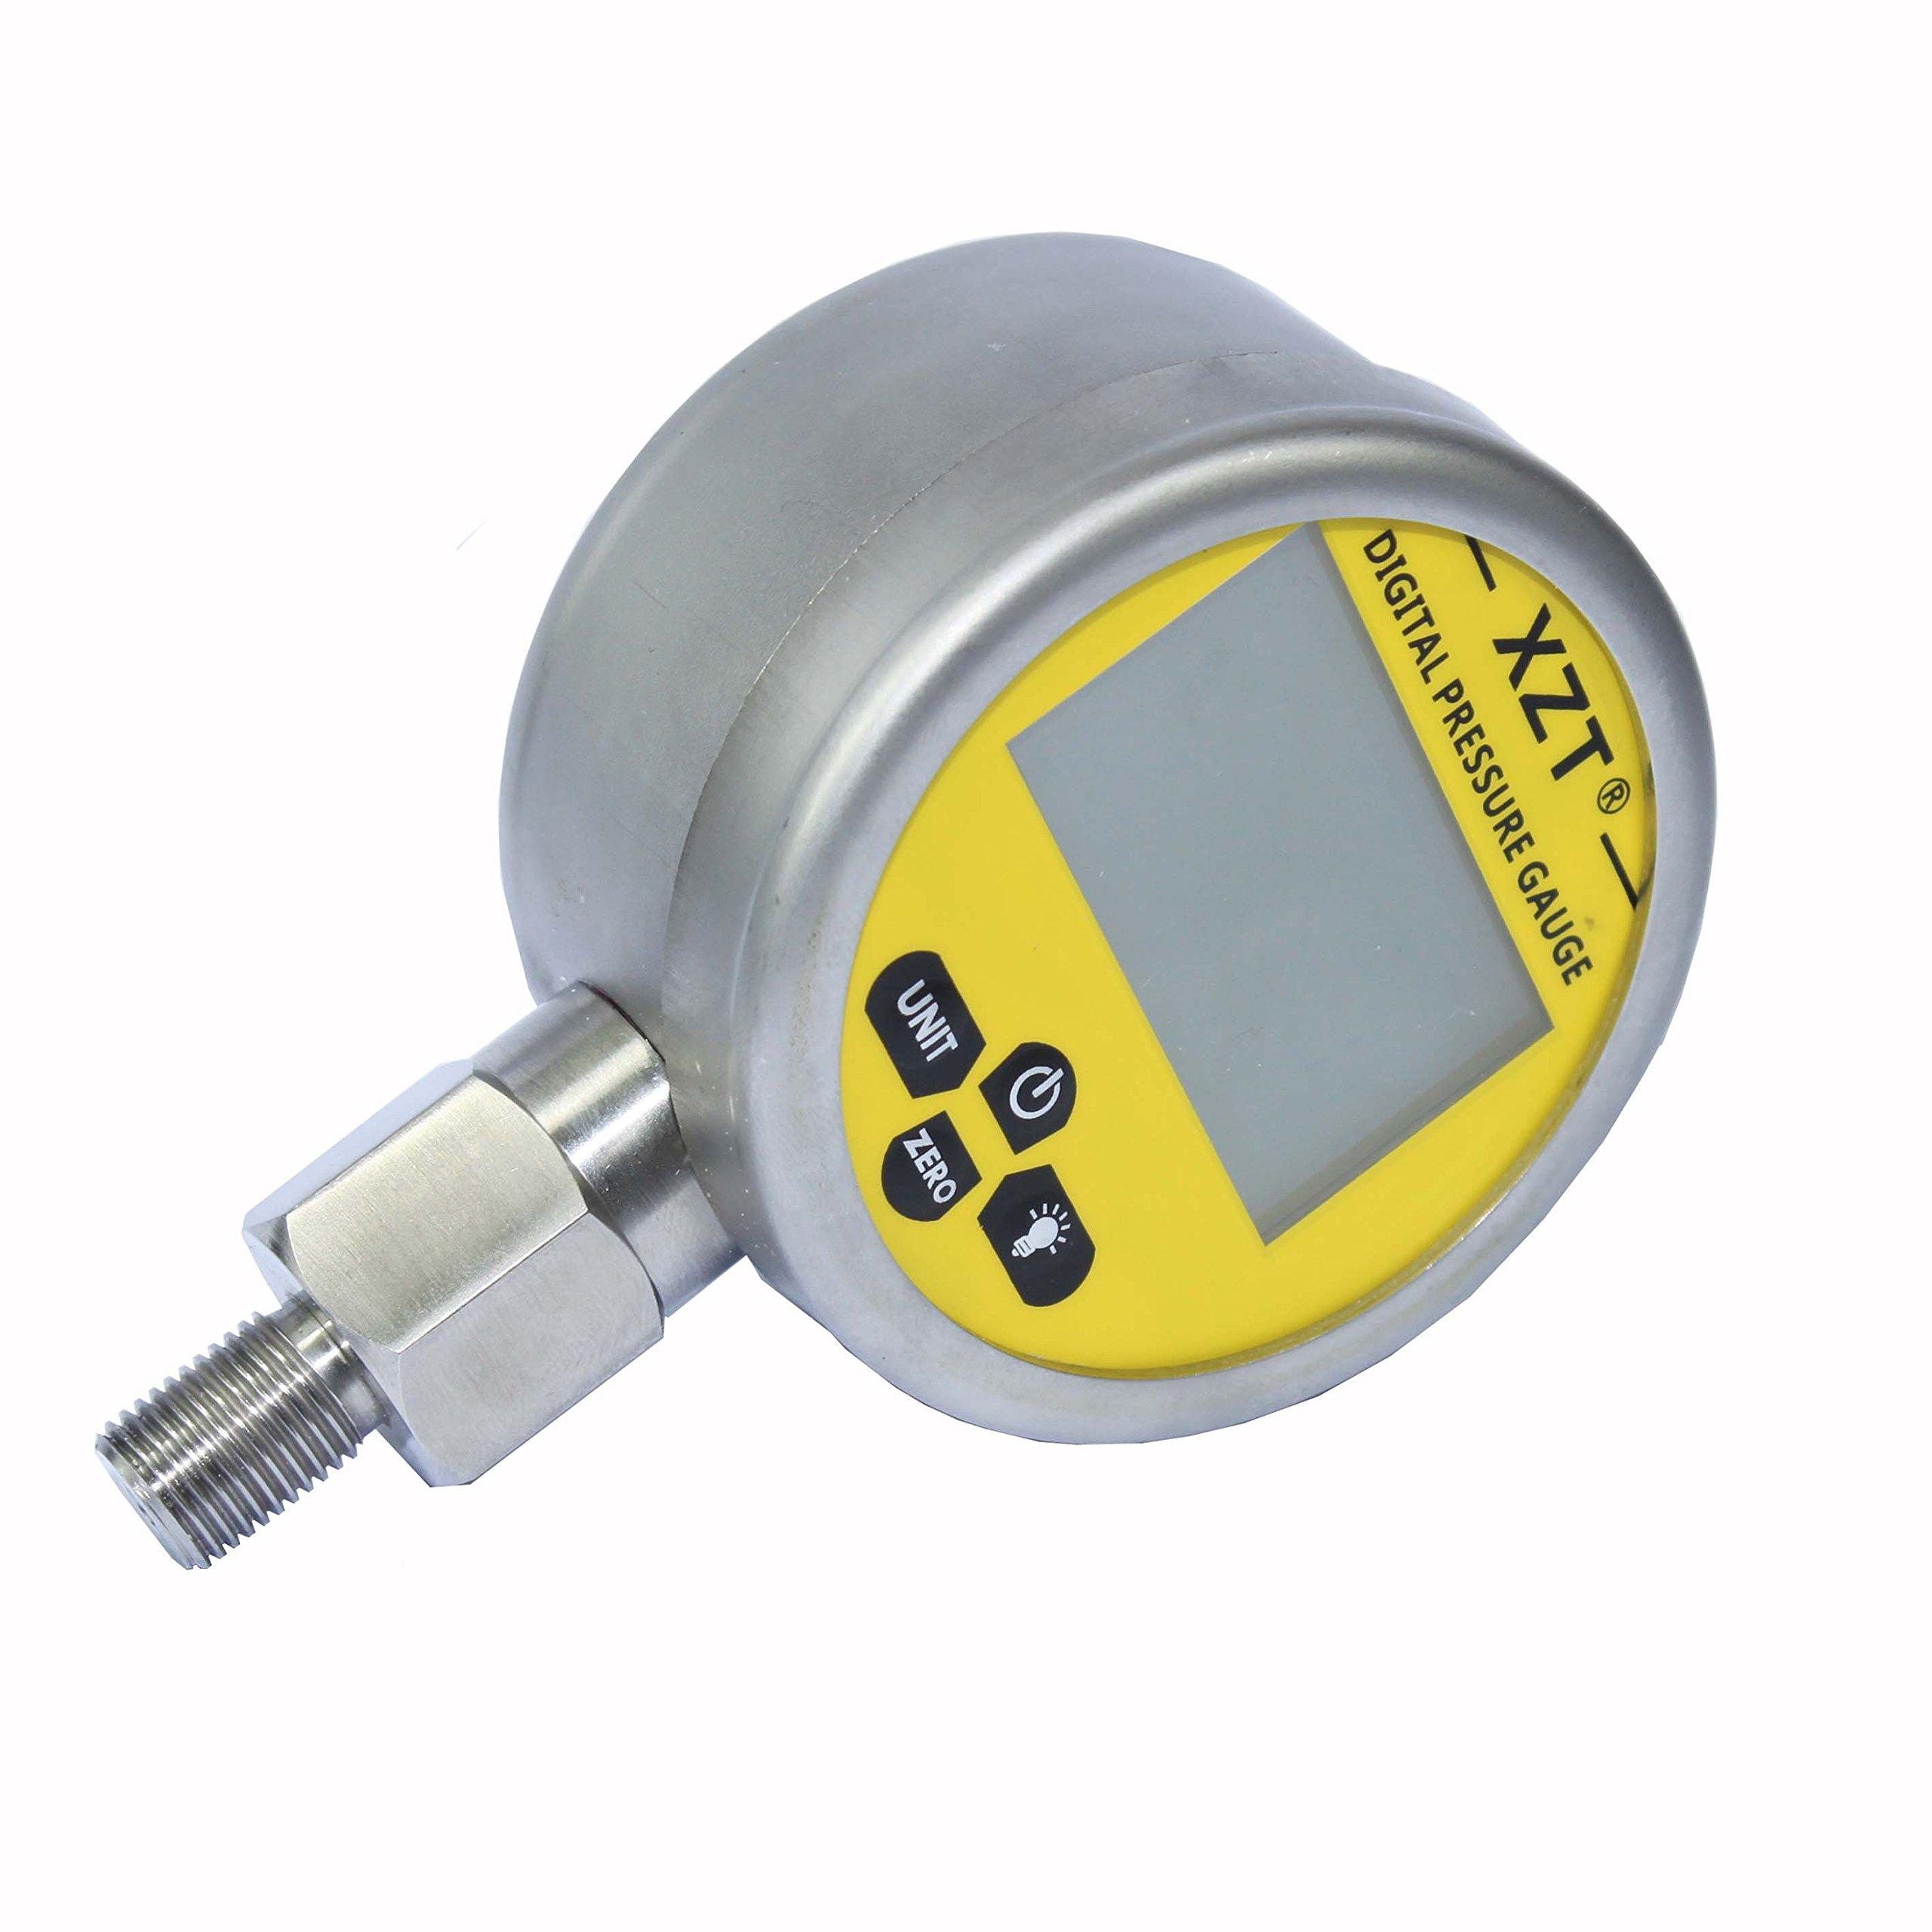 XZT Digital Hydraulic Pressure Gauge 3.15'' 0~6000PSI -1/4BSP-Base Entry